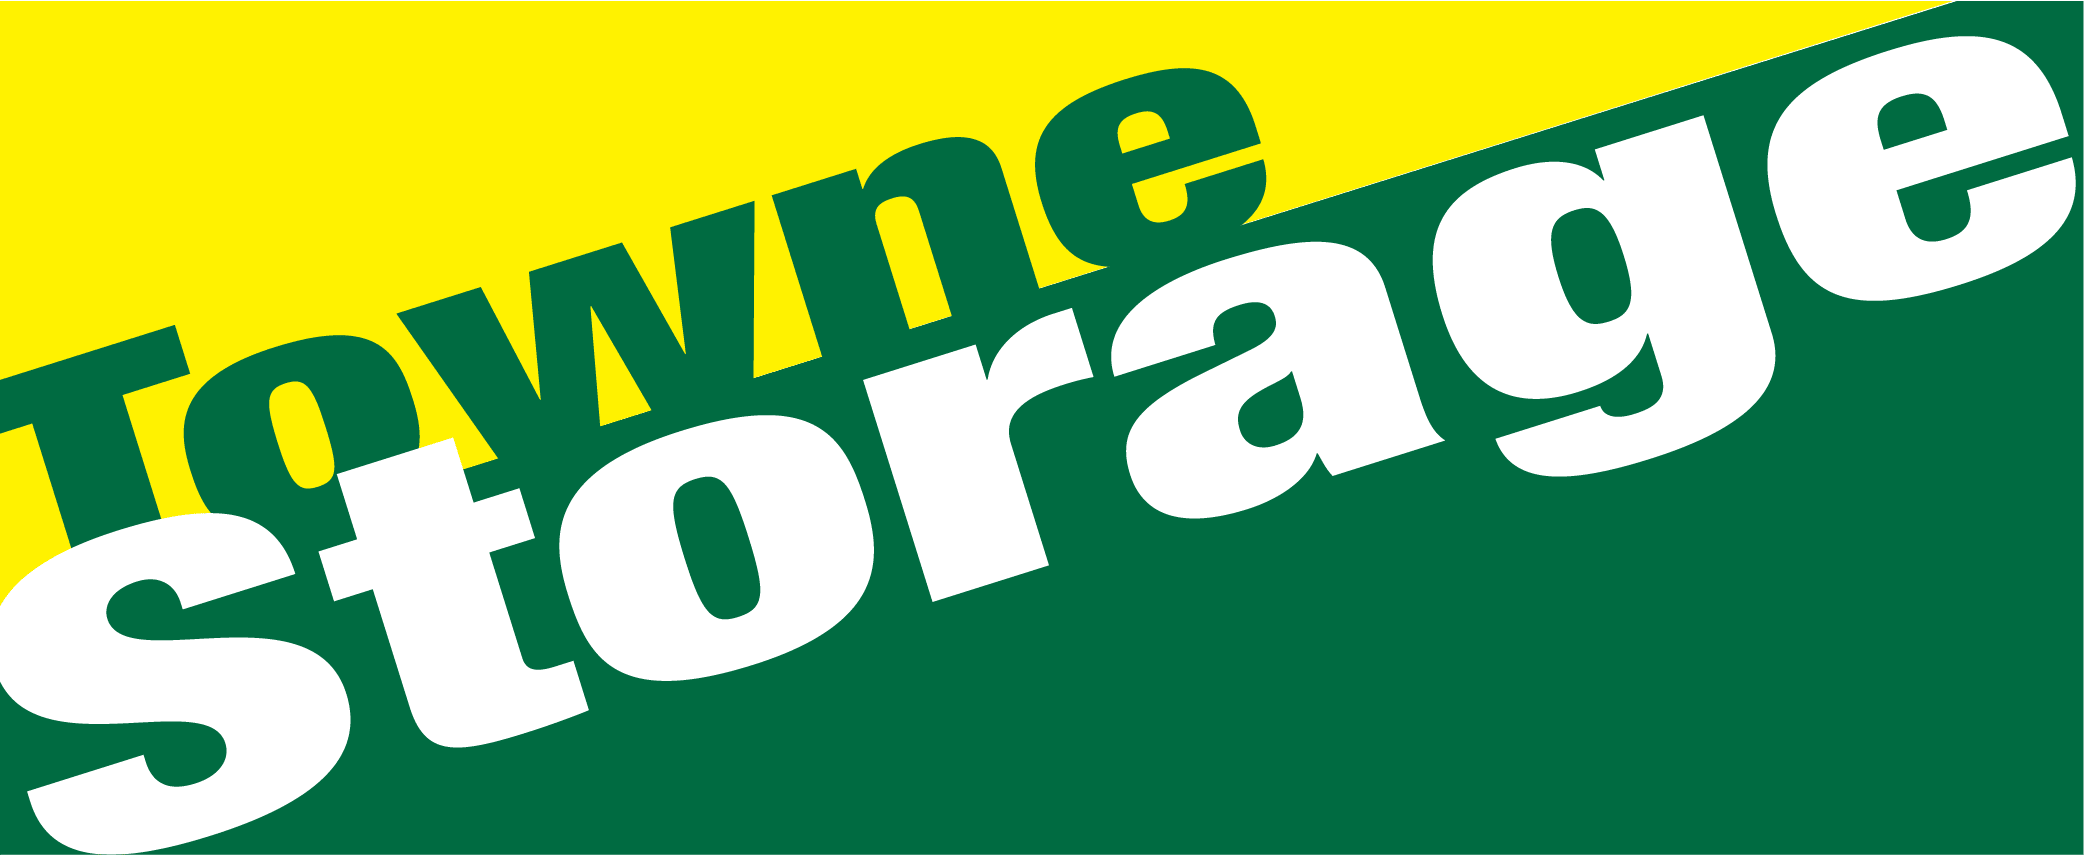 Towne Storage - Gateway logo